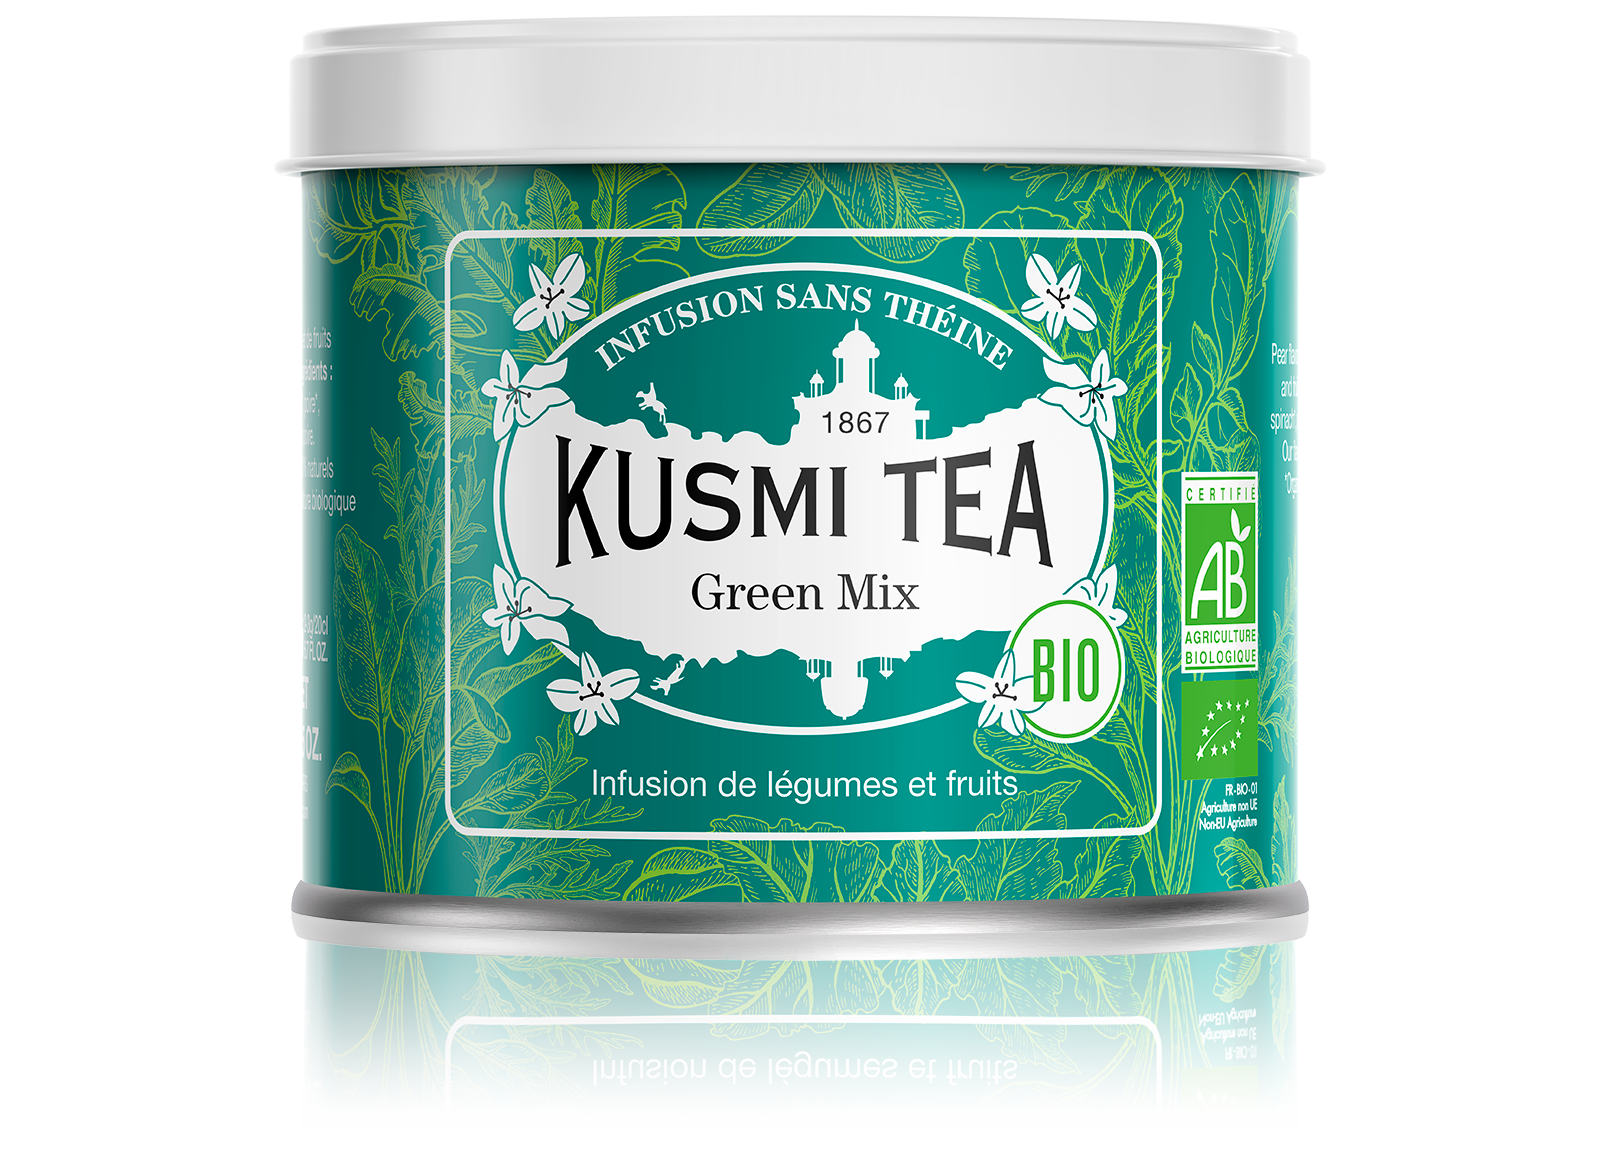 Green Mix (Infusion bio) - Kusmi Tea